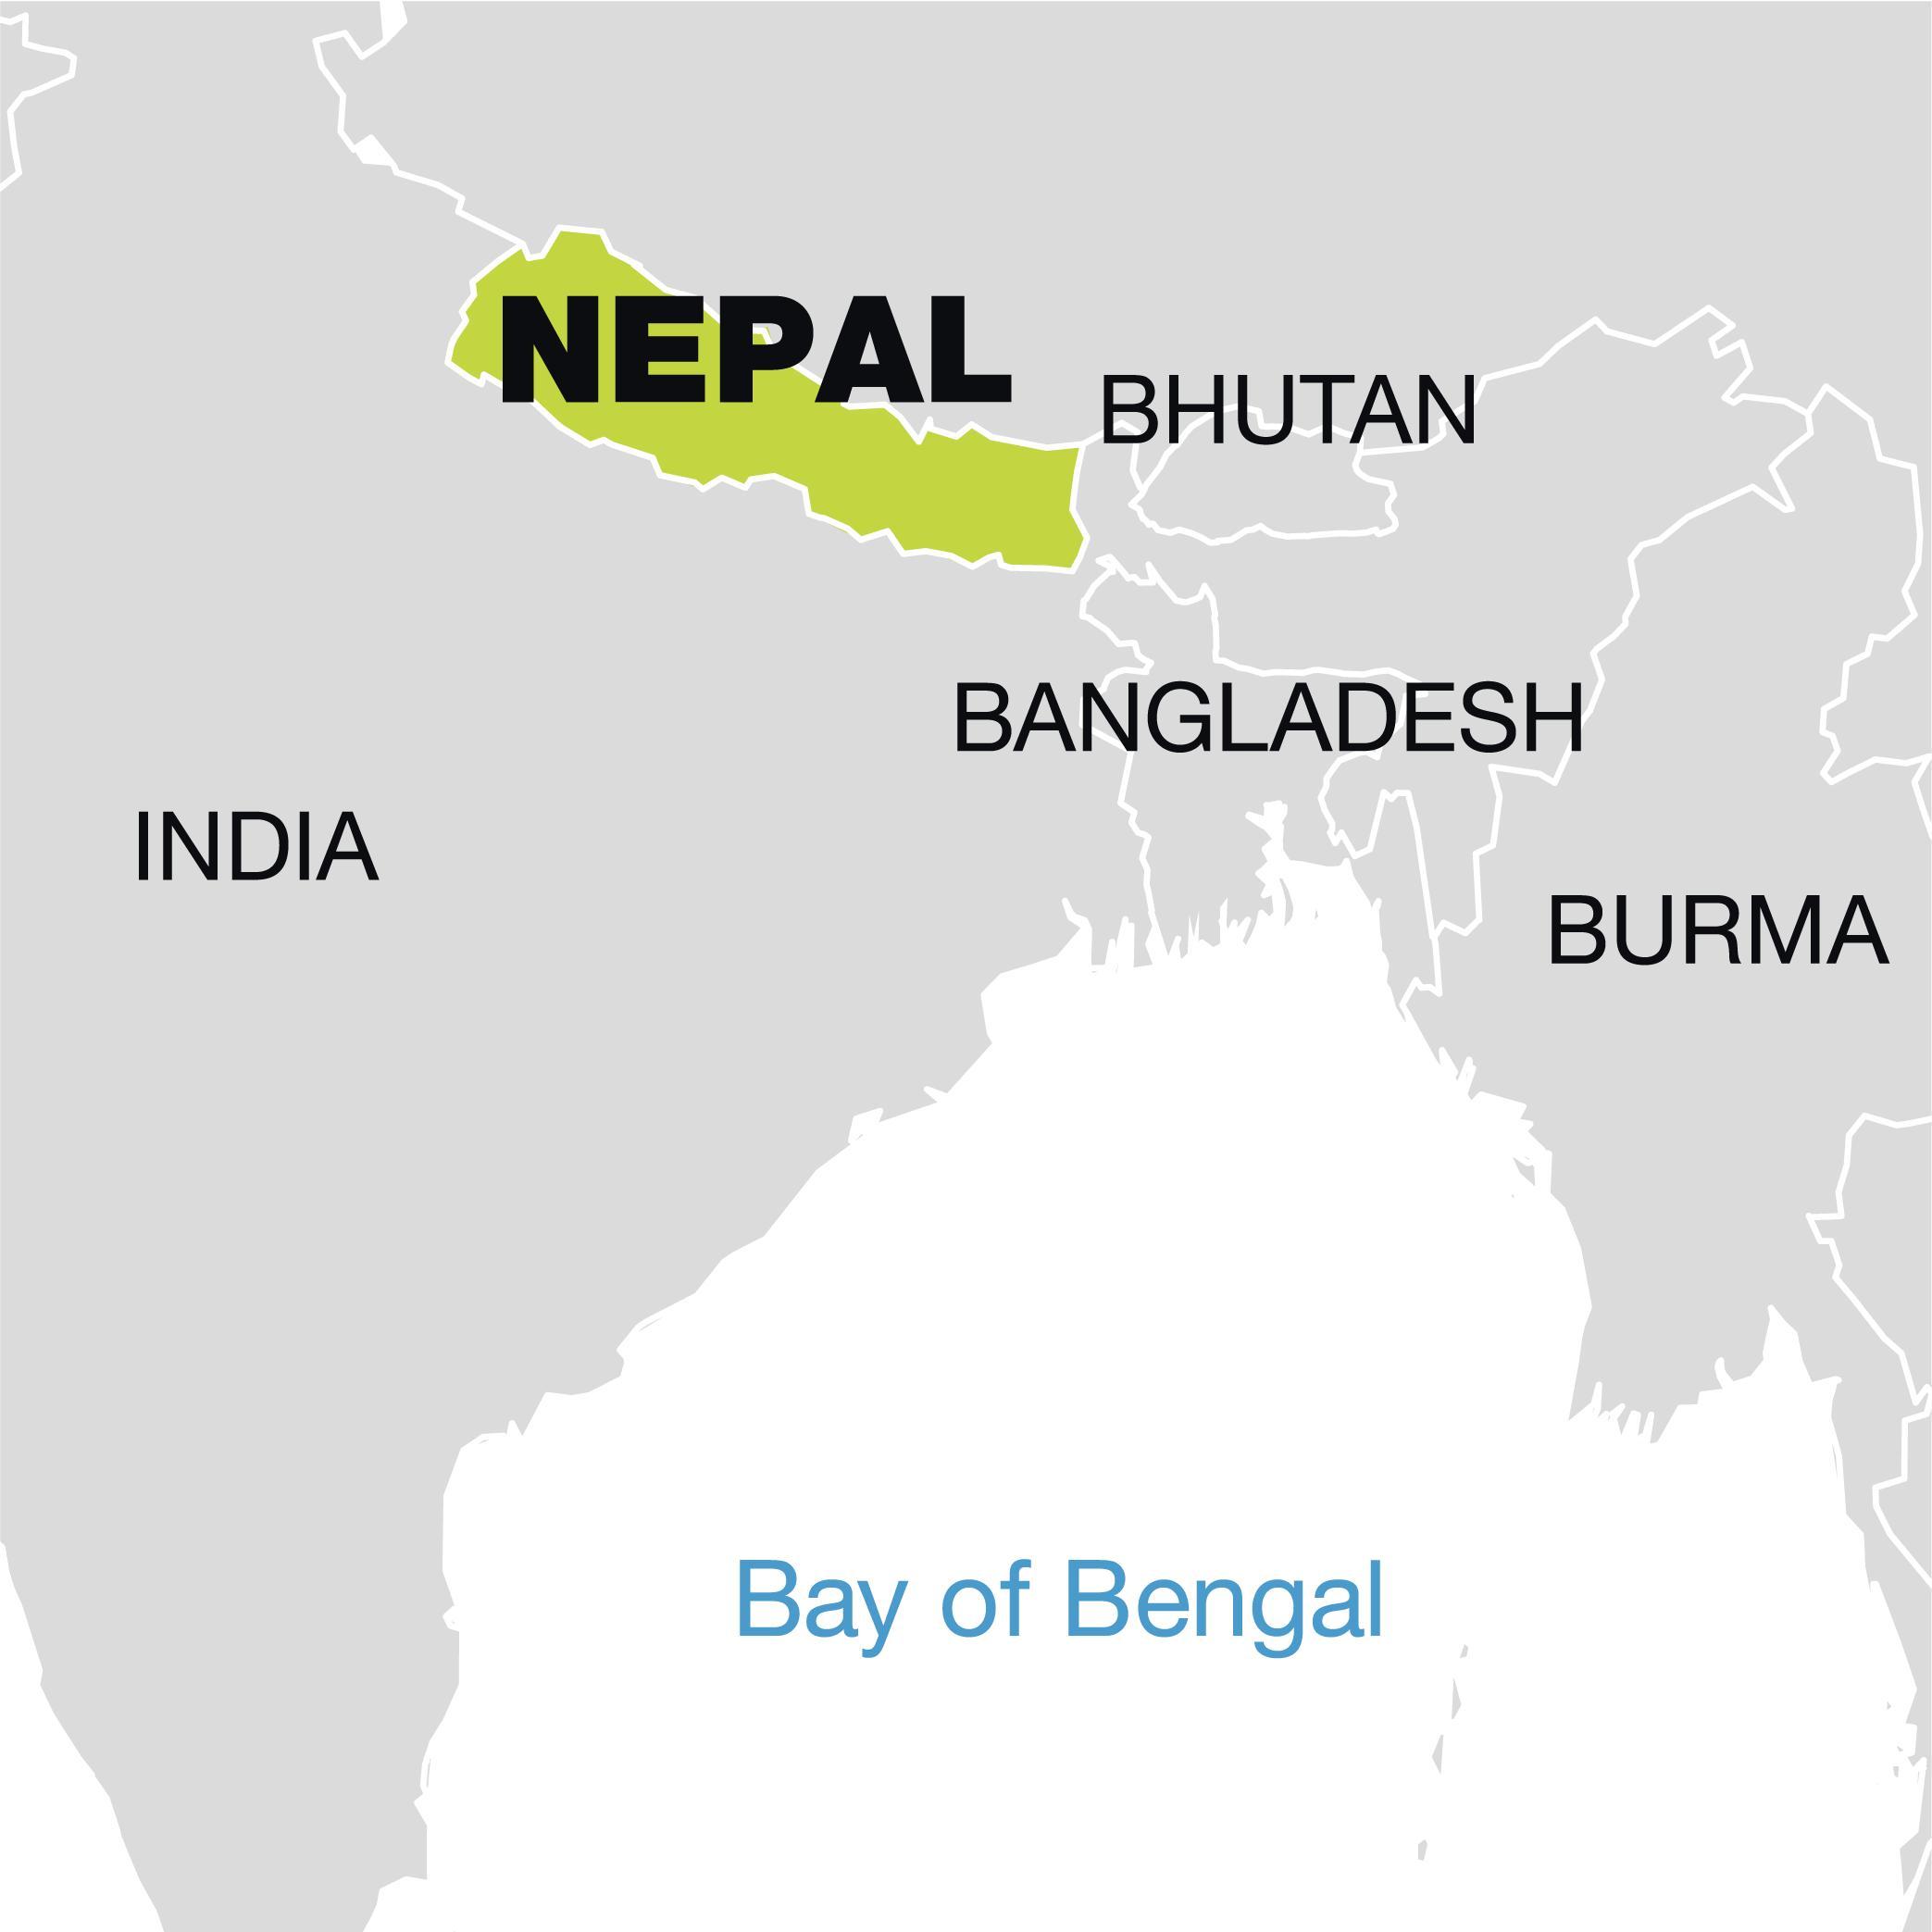 Nepal world map world map showing nepal southern asia asia world map showing nepal gumiabroncs Image collections